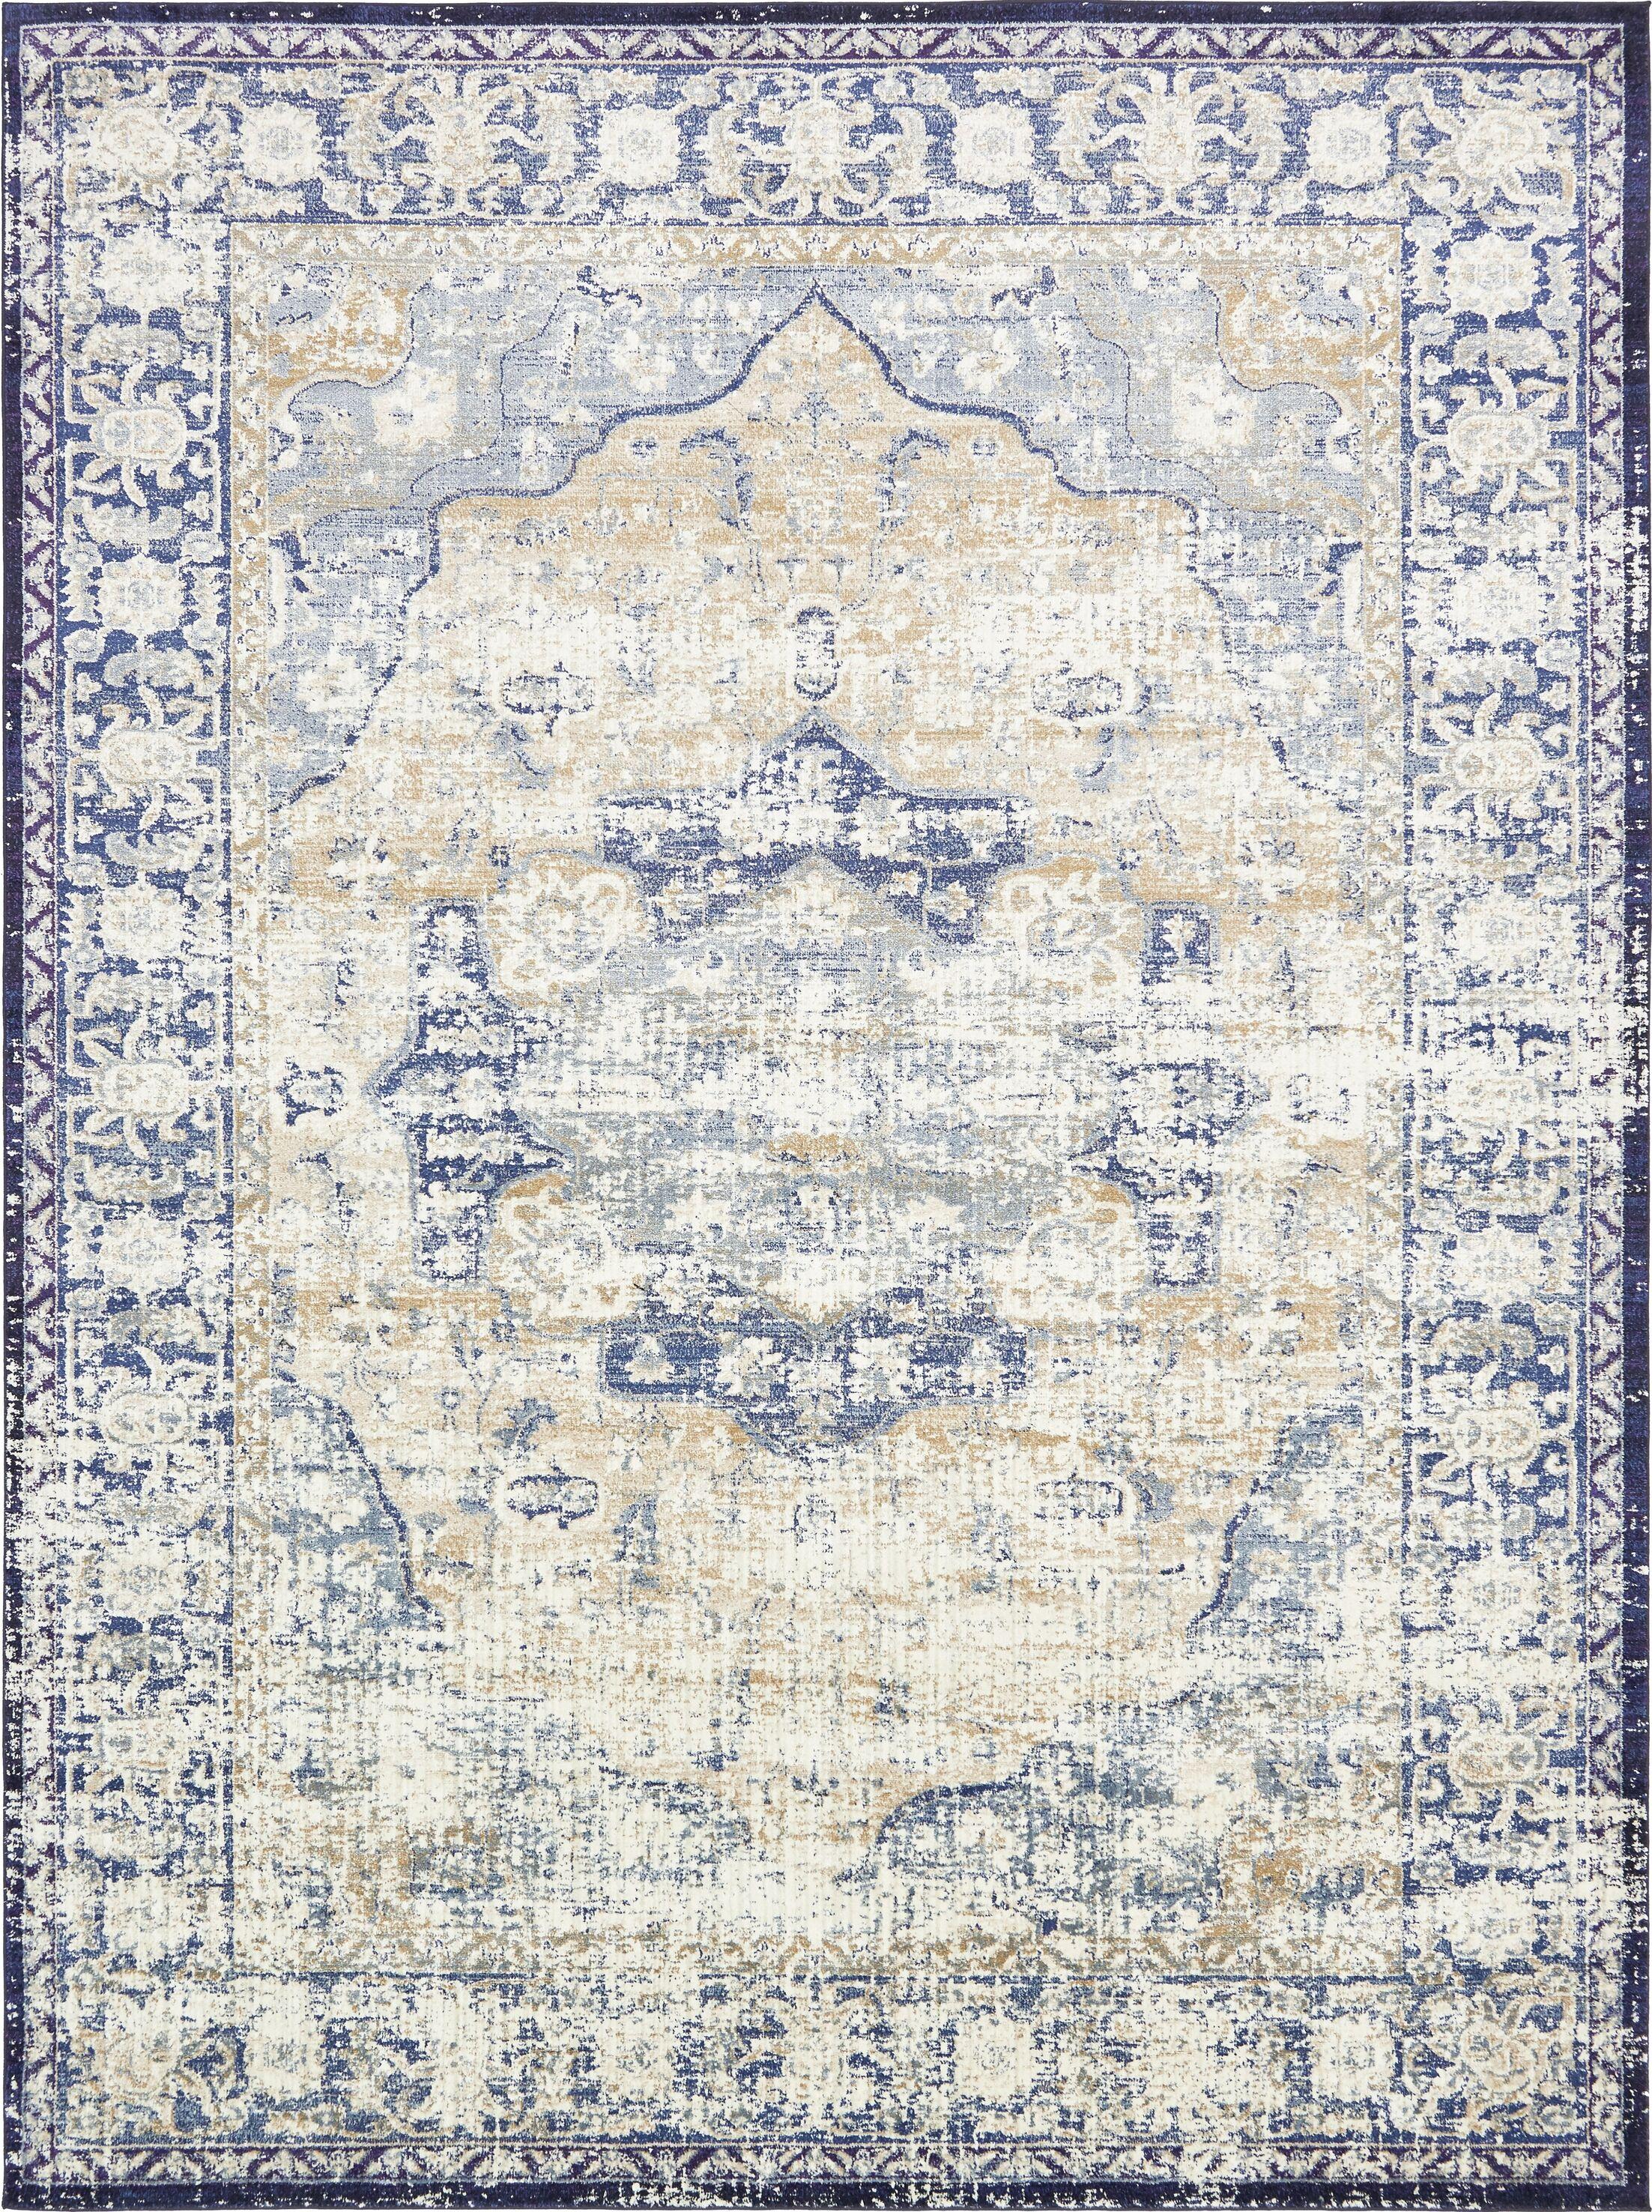 Koury Blue/Beige Area Rug Rug Size: Rectangle 10'6